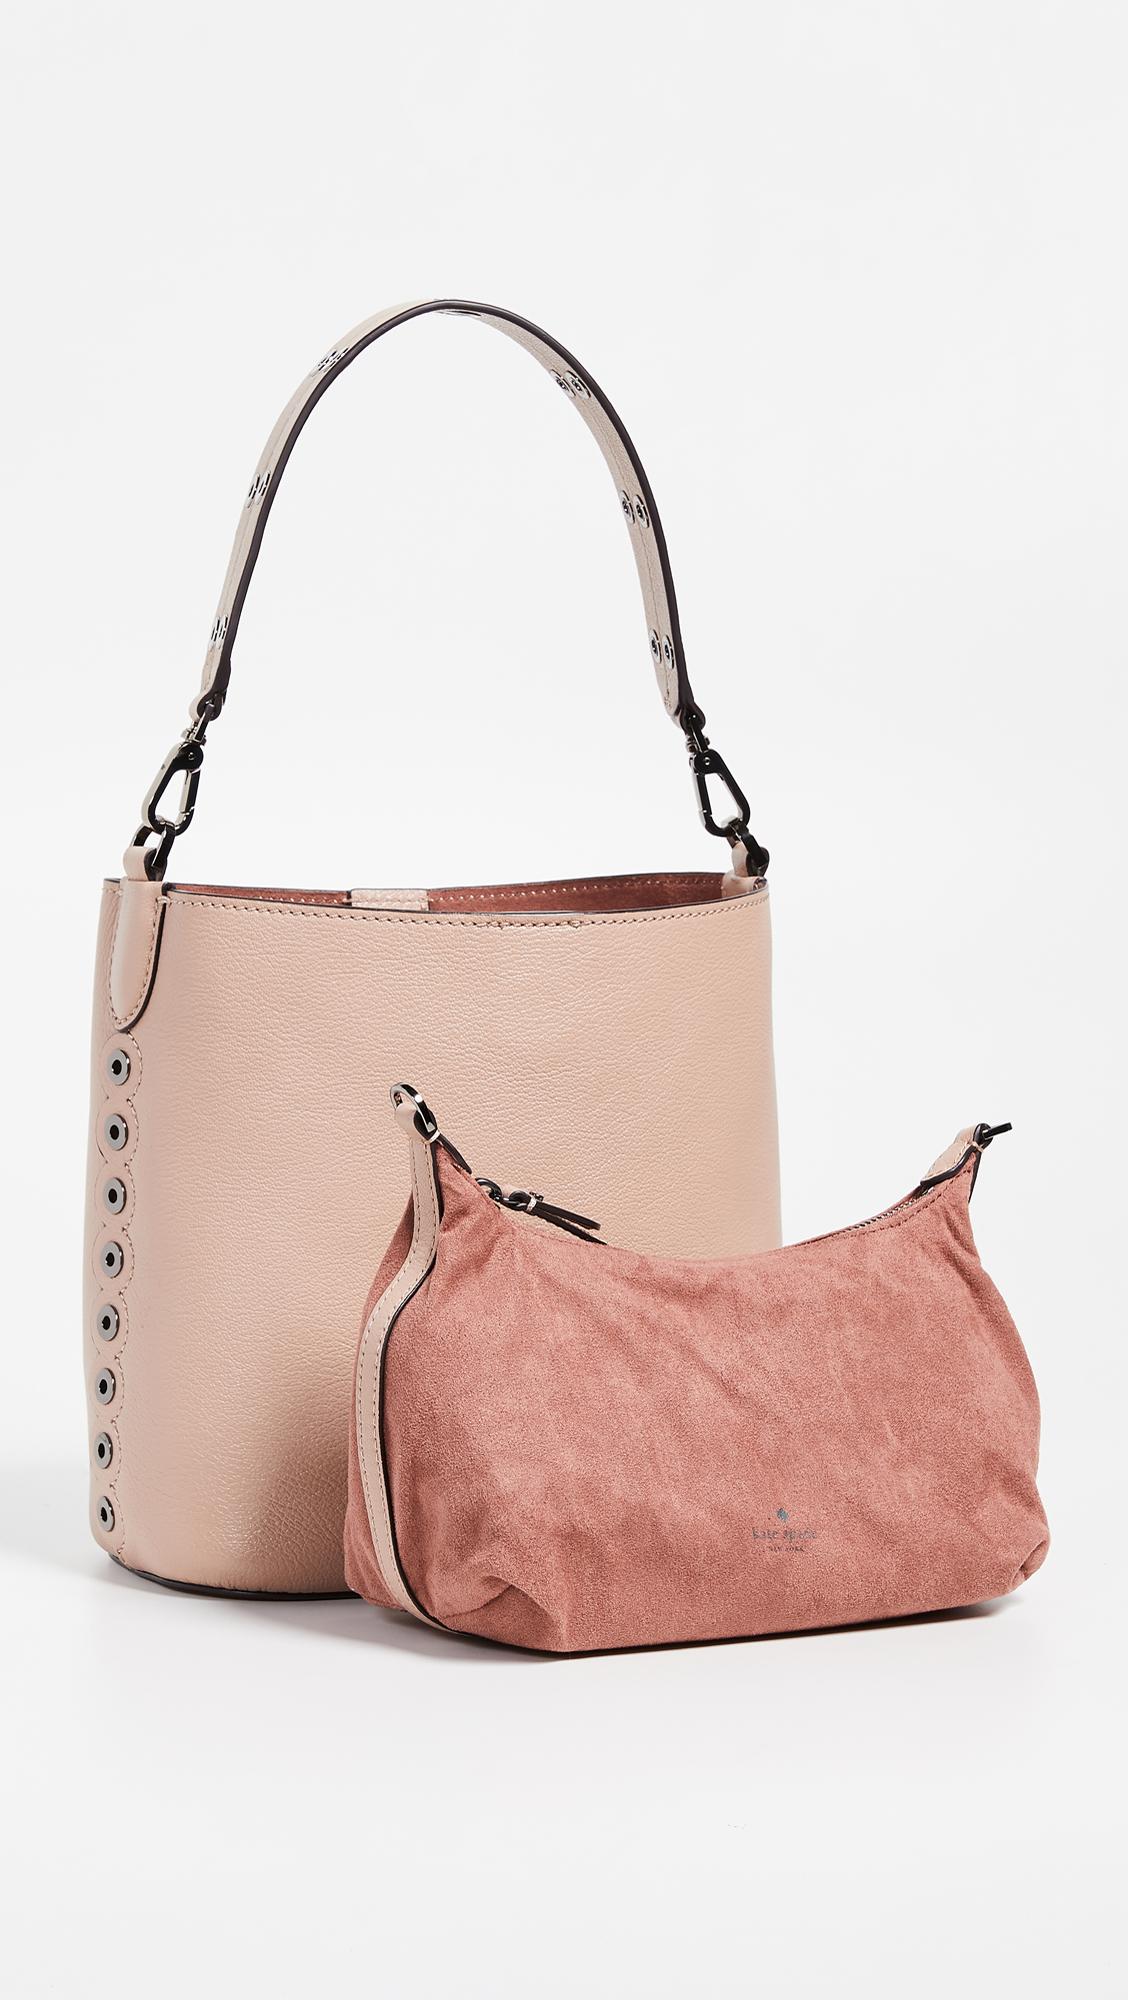 294201f53329 Kate Spade New York Atlantic Avenue Small Libby Bucket Bag